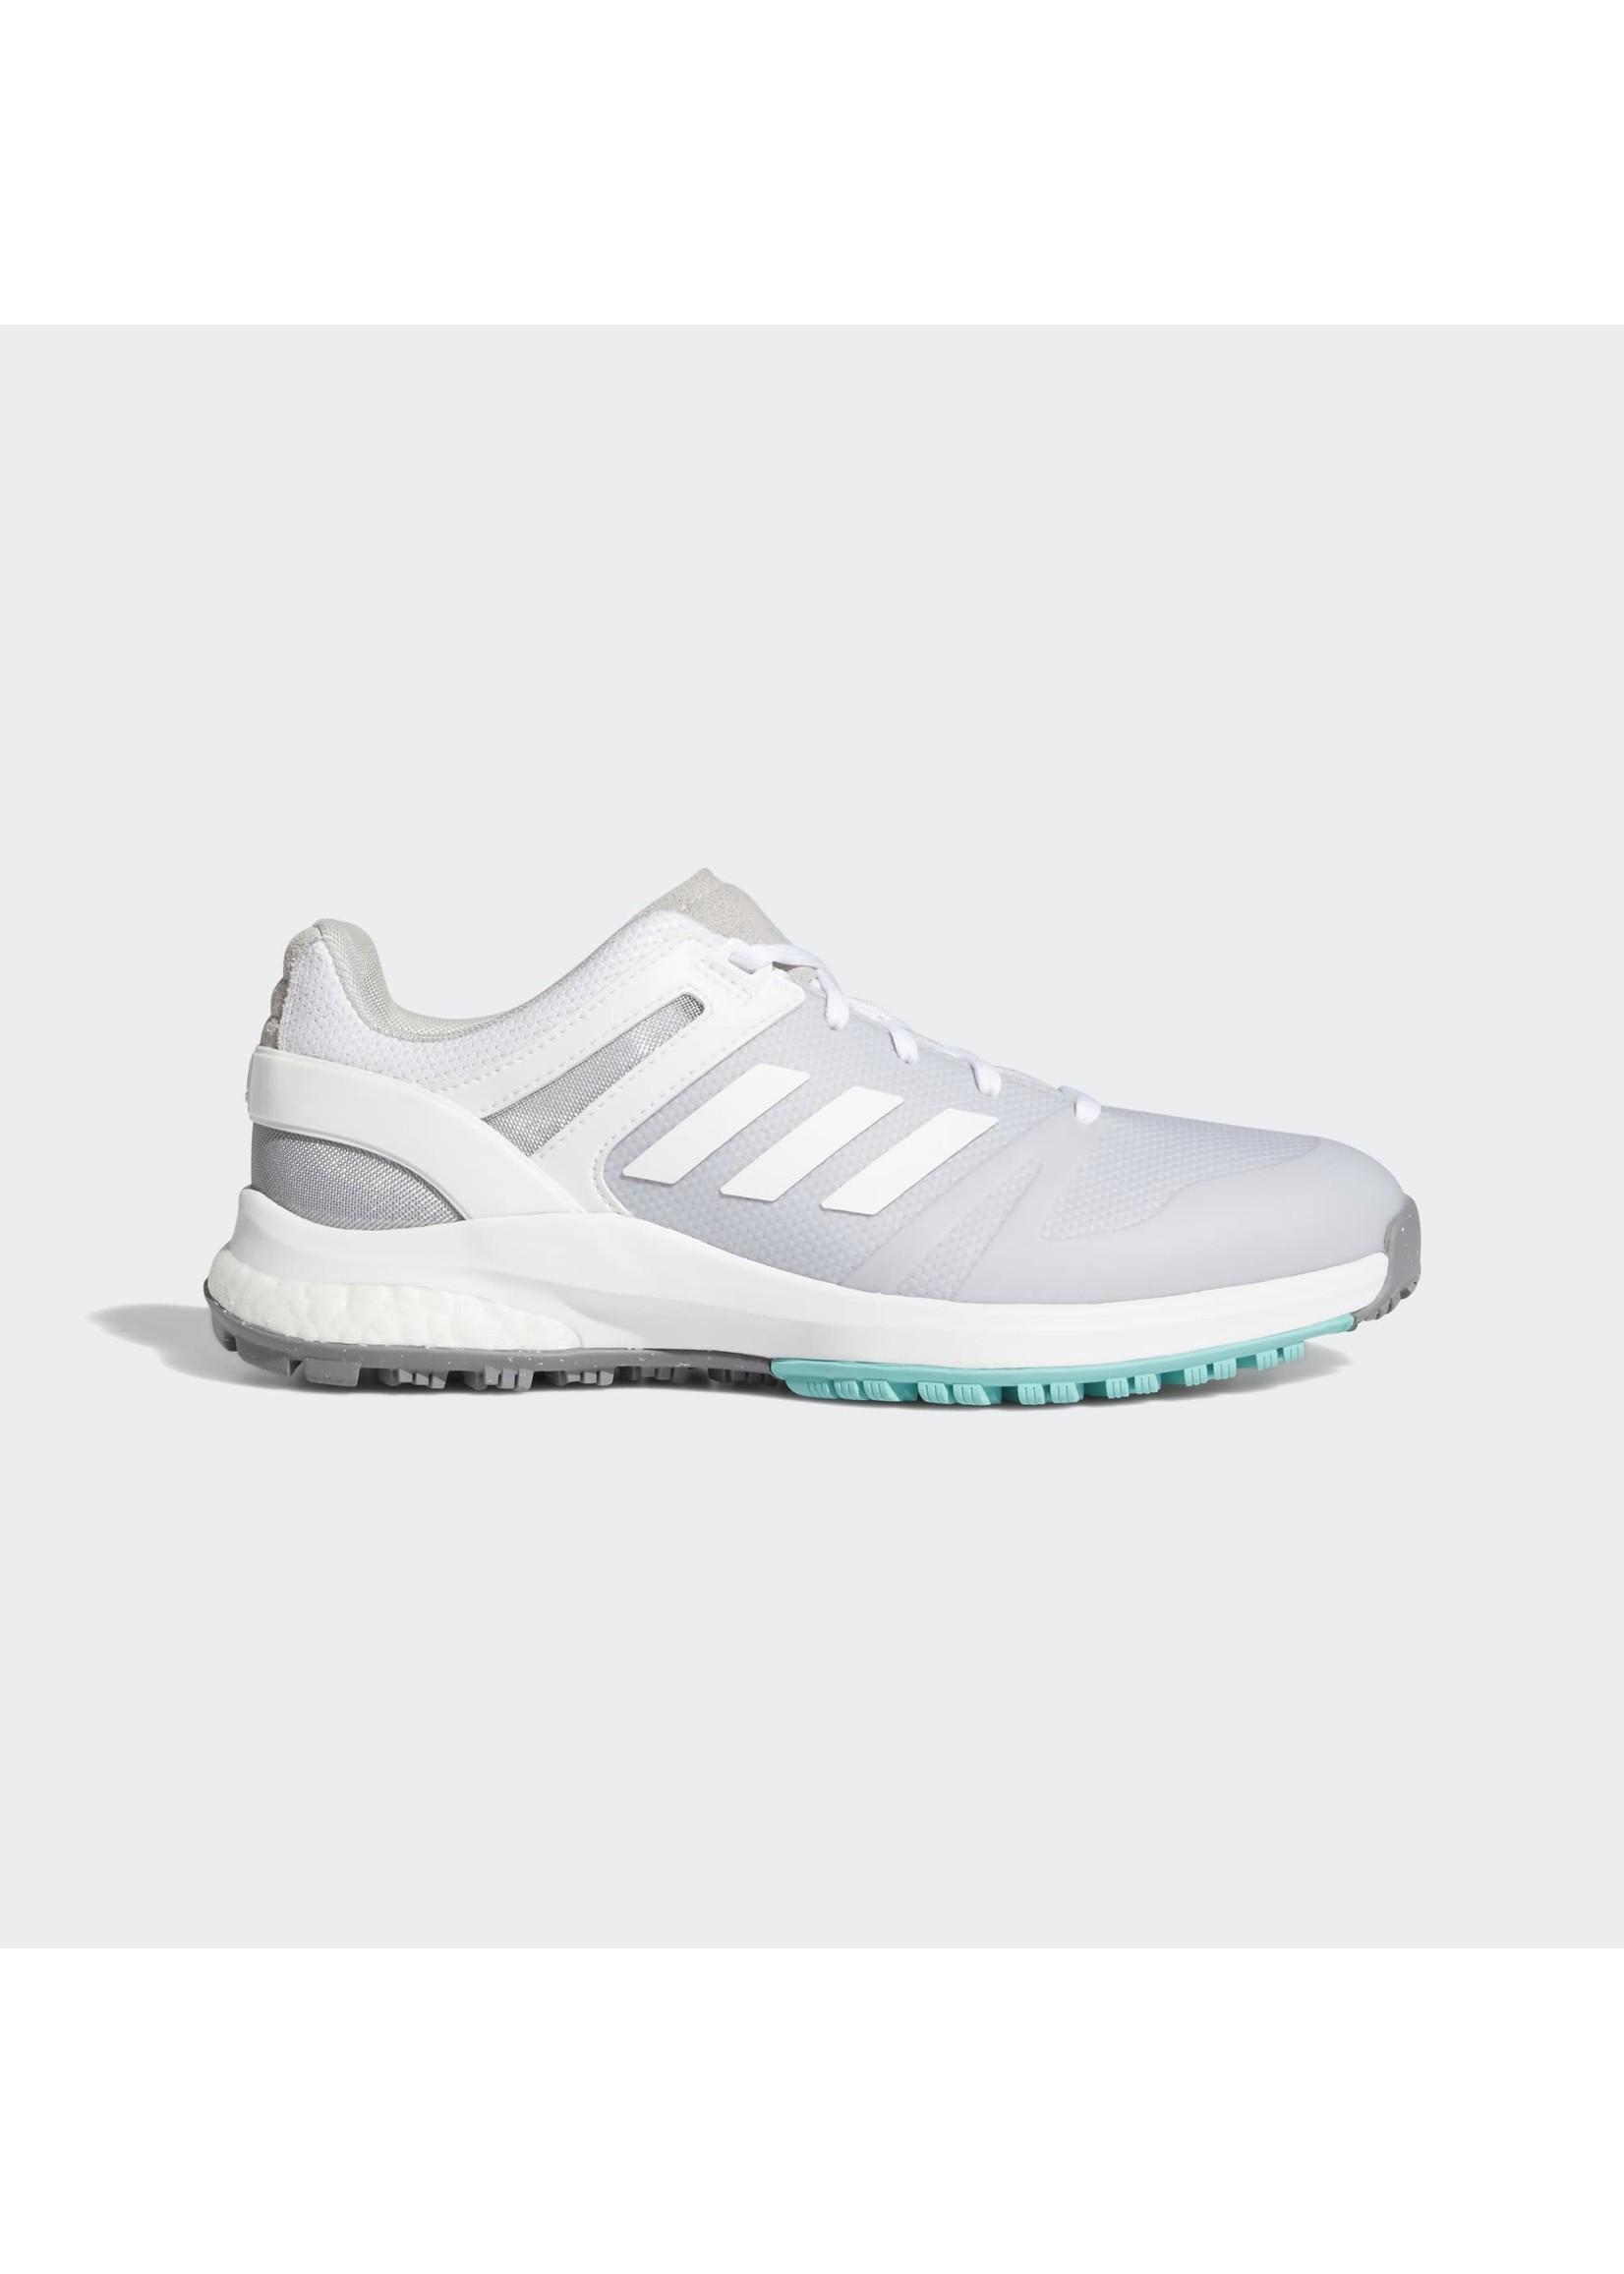 Adidas Adidas EQT Ladies Spikeless Golf Shoe, White/Grey/Green (2021)